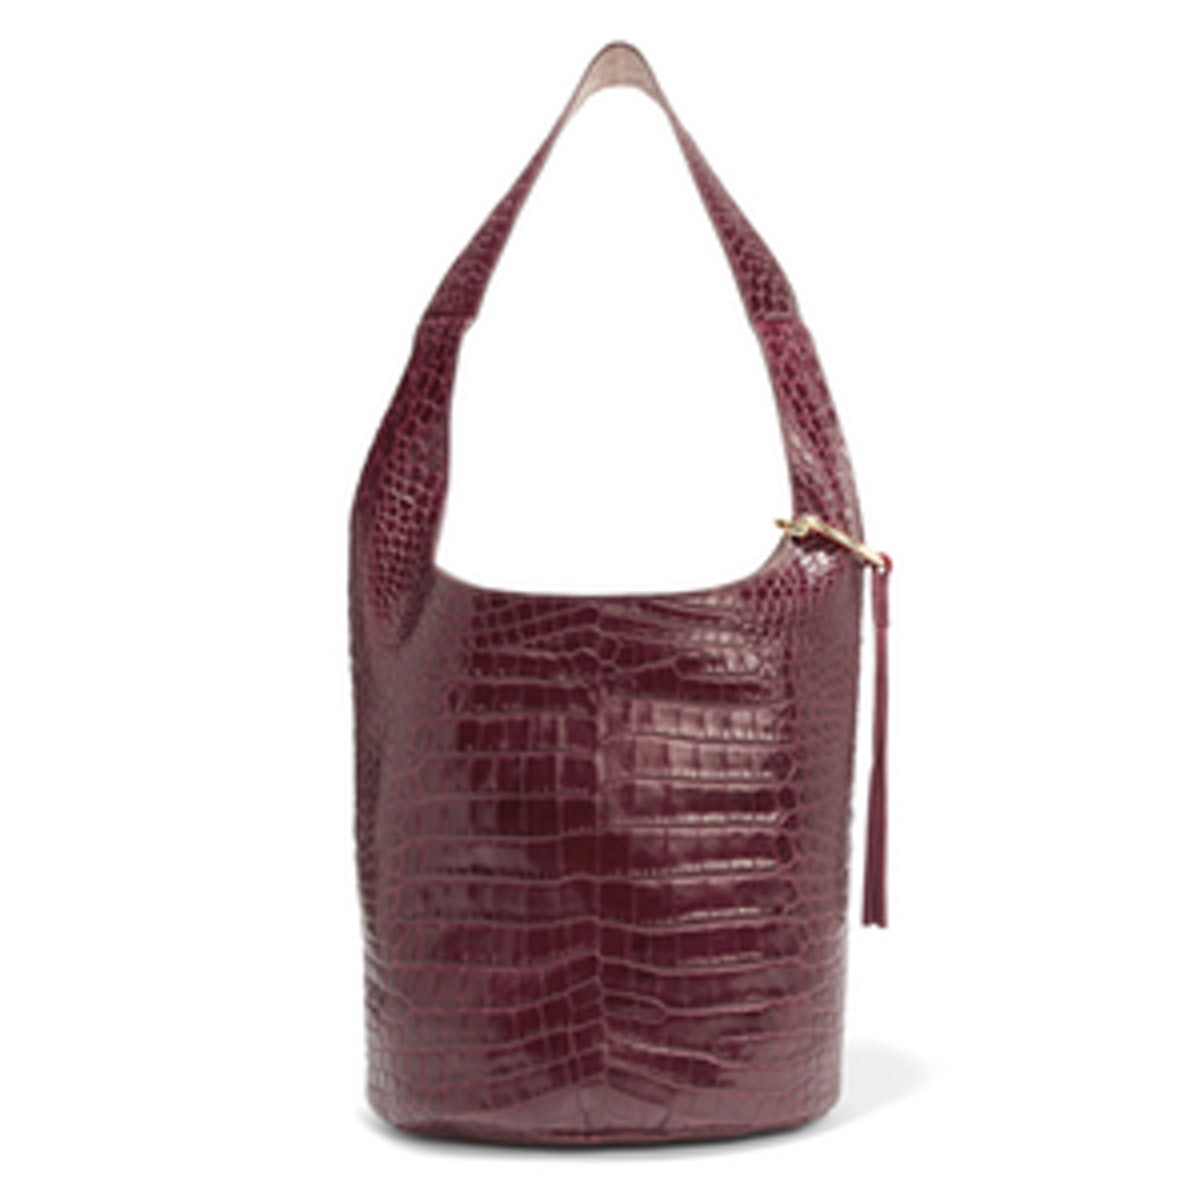 Finley Courier Croc-Effect Leather Shoulder Bag